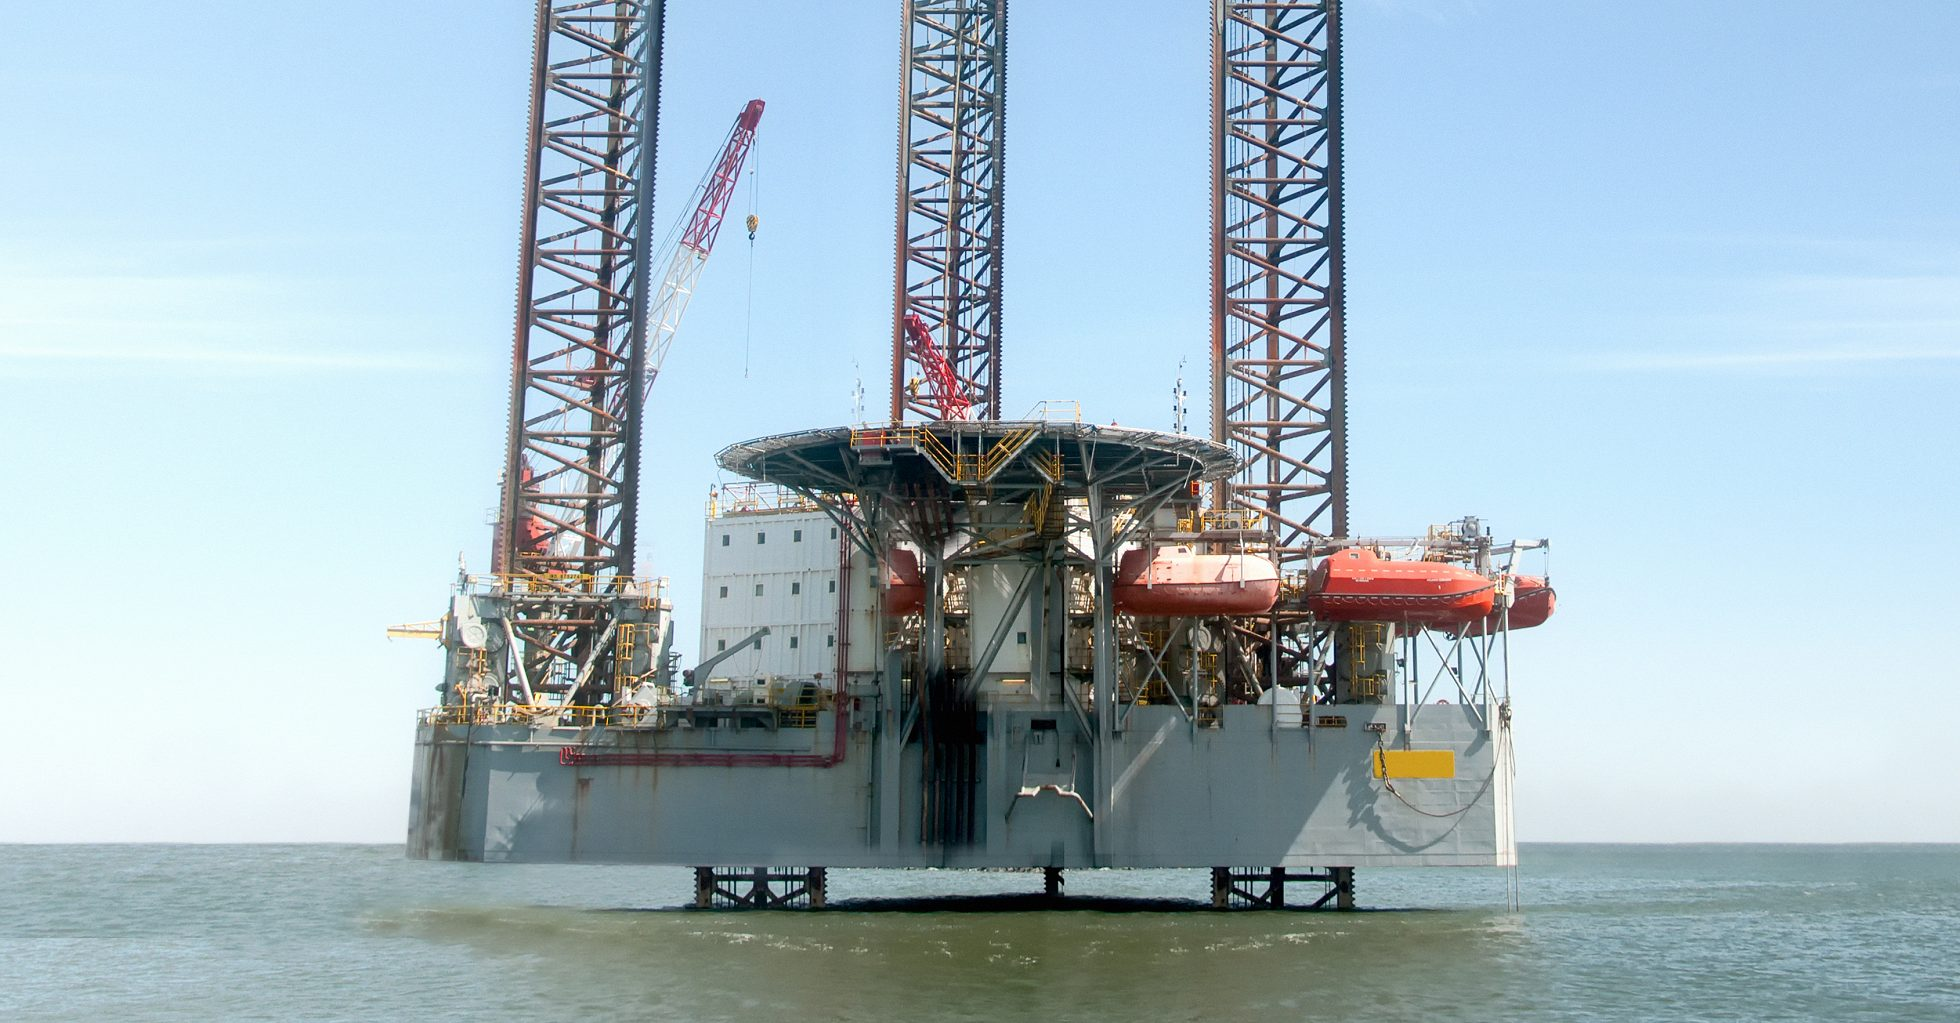 Danish Oil rIG